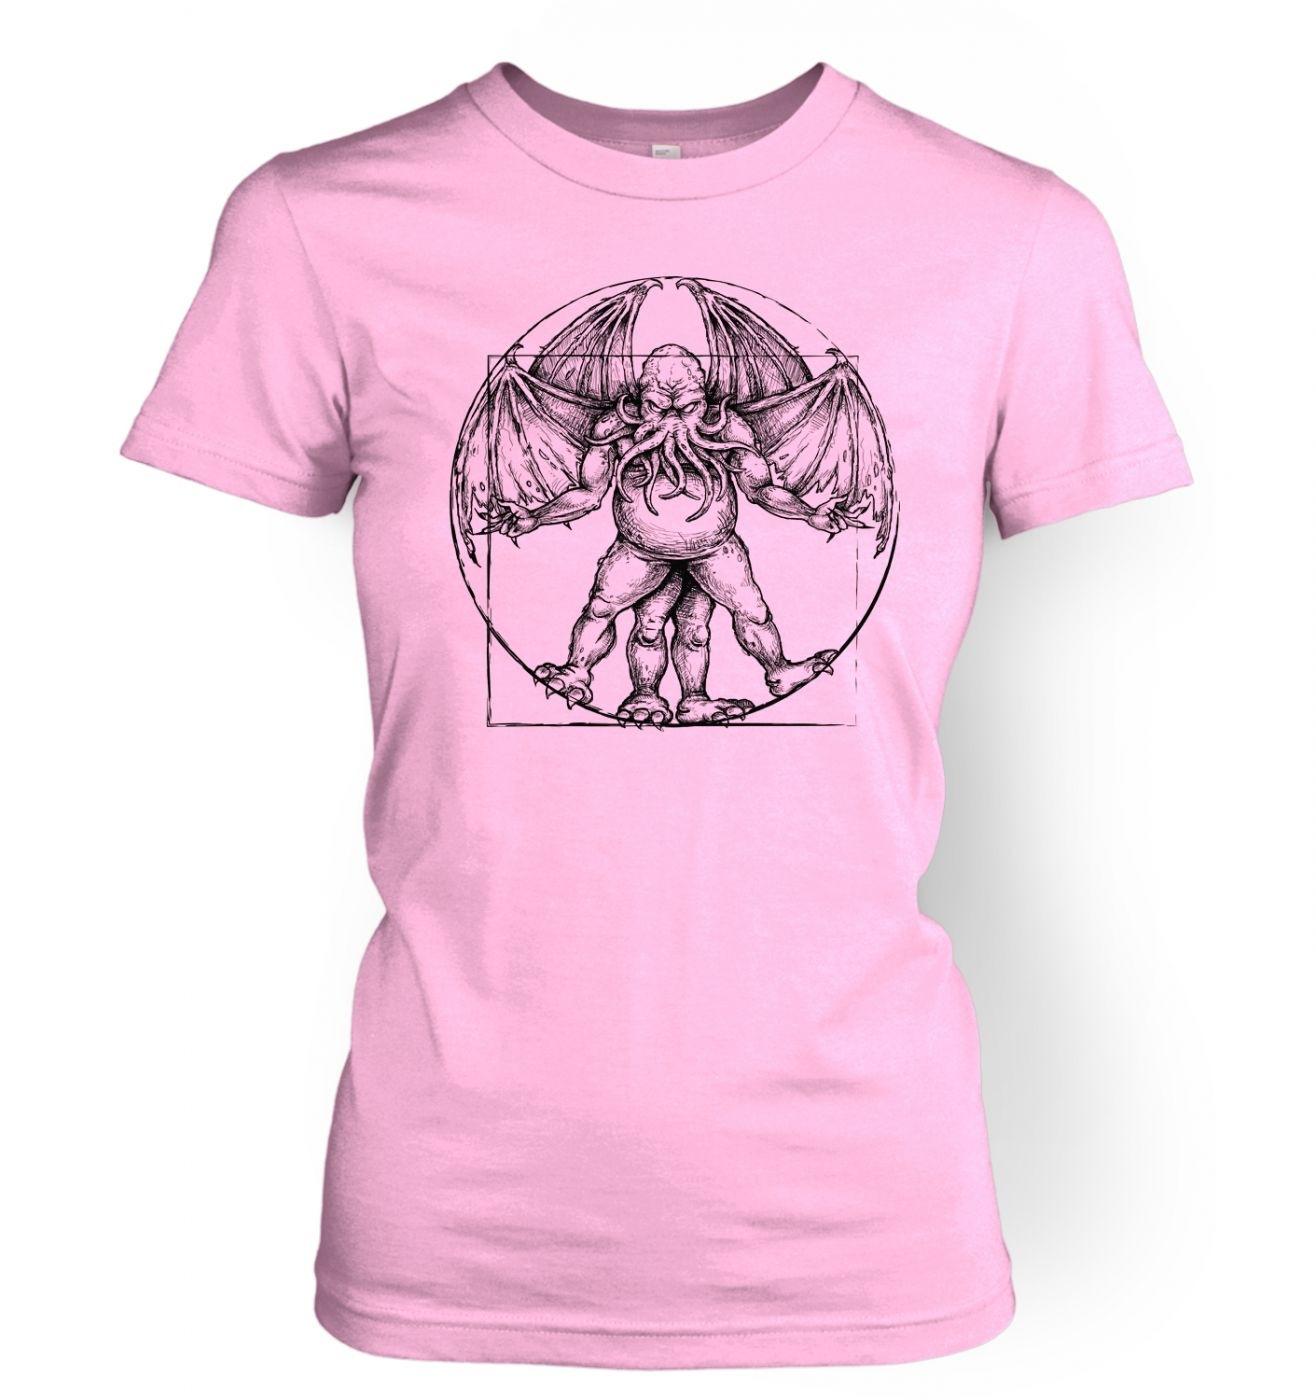 Vitruvian Cthulhu women's t-shirt